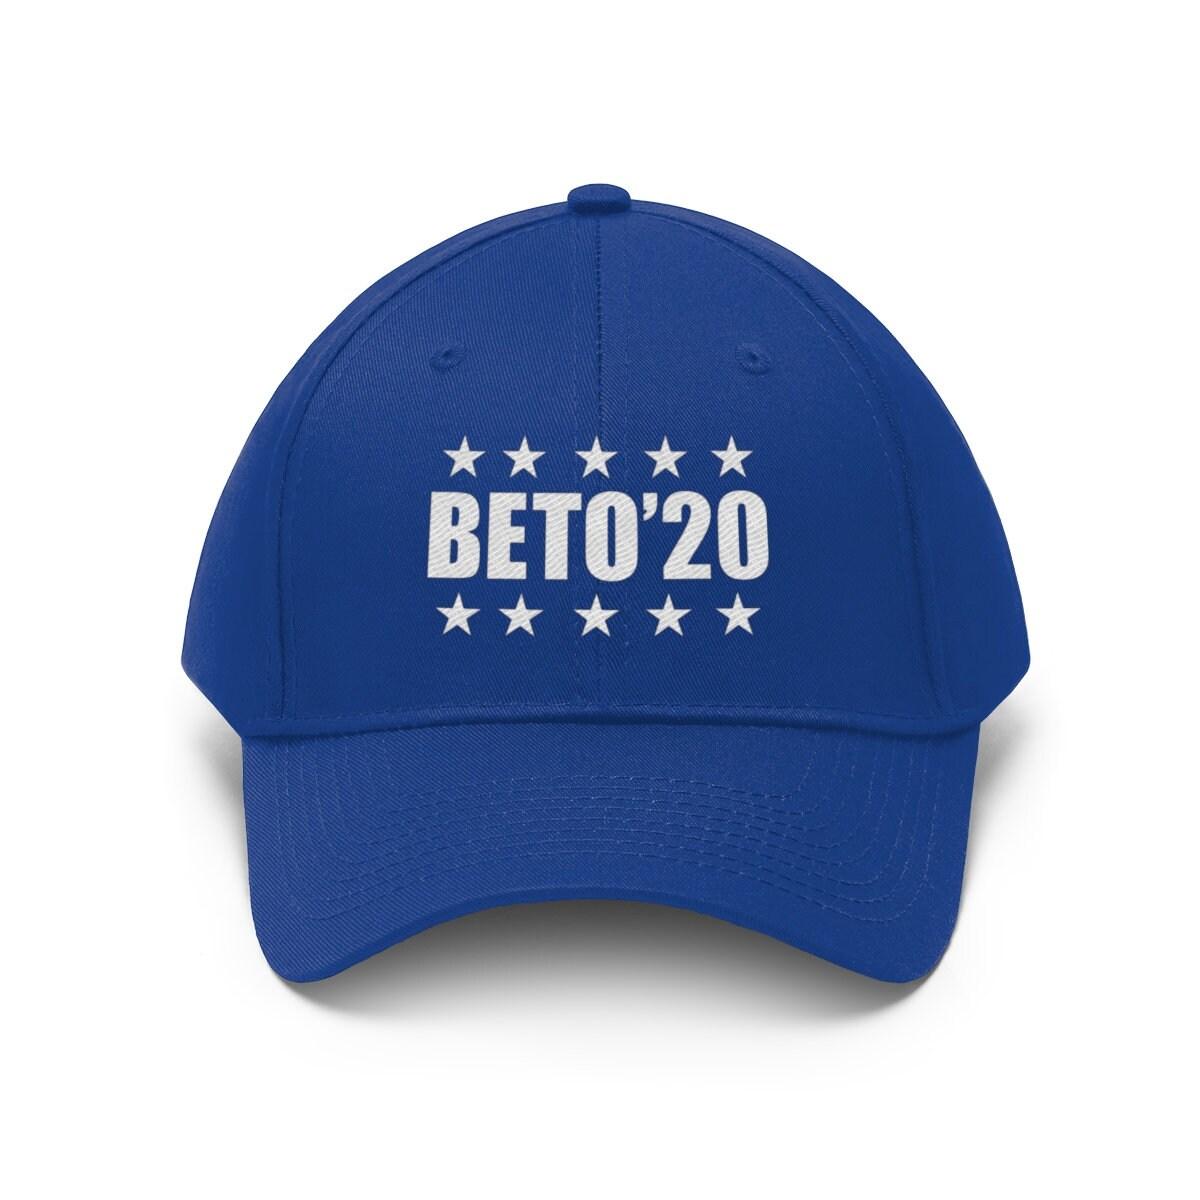 21b1d2f8b Beto 2020 Cap Unisex Embroidered Hat ~ Beto O'Rourke   Blue Wave Texas    Texas Democrat   Election 2020   Senator Beto ~ Beto 2020 Election